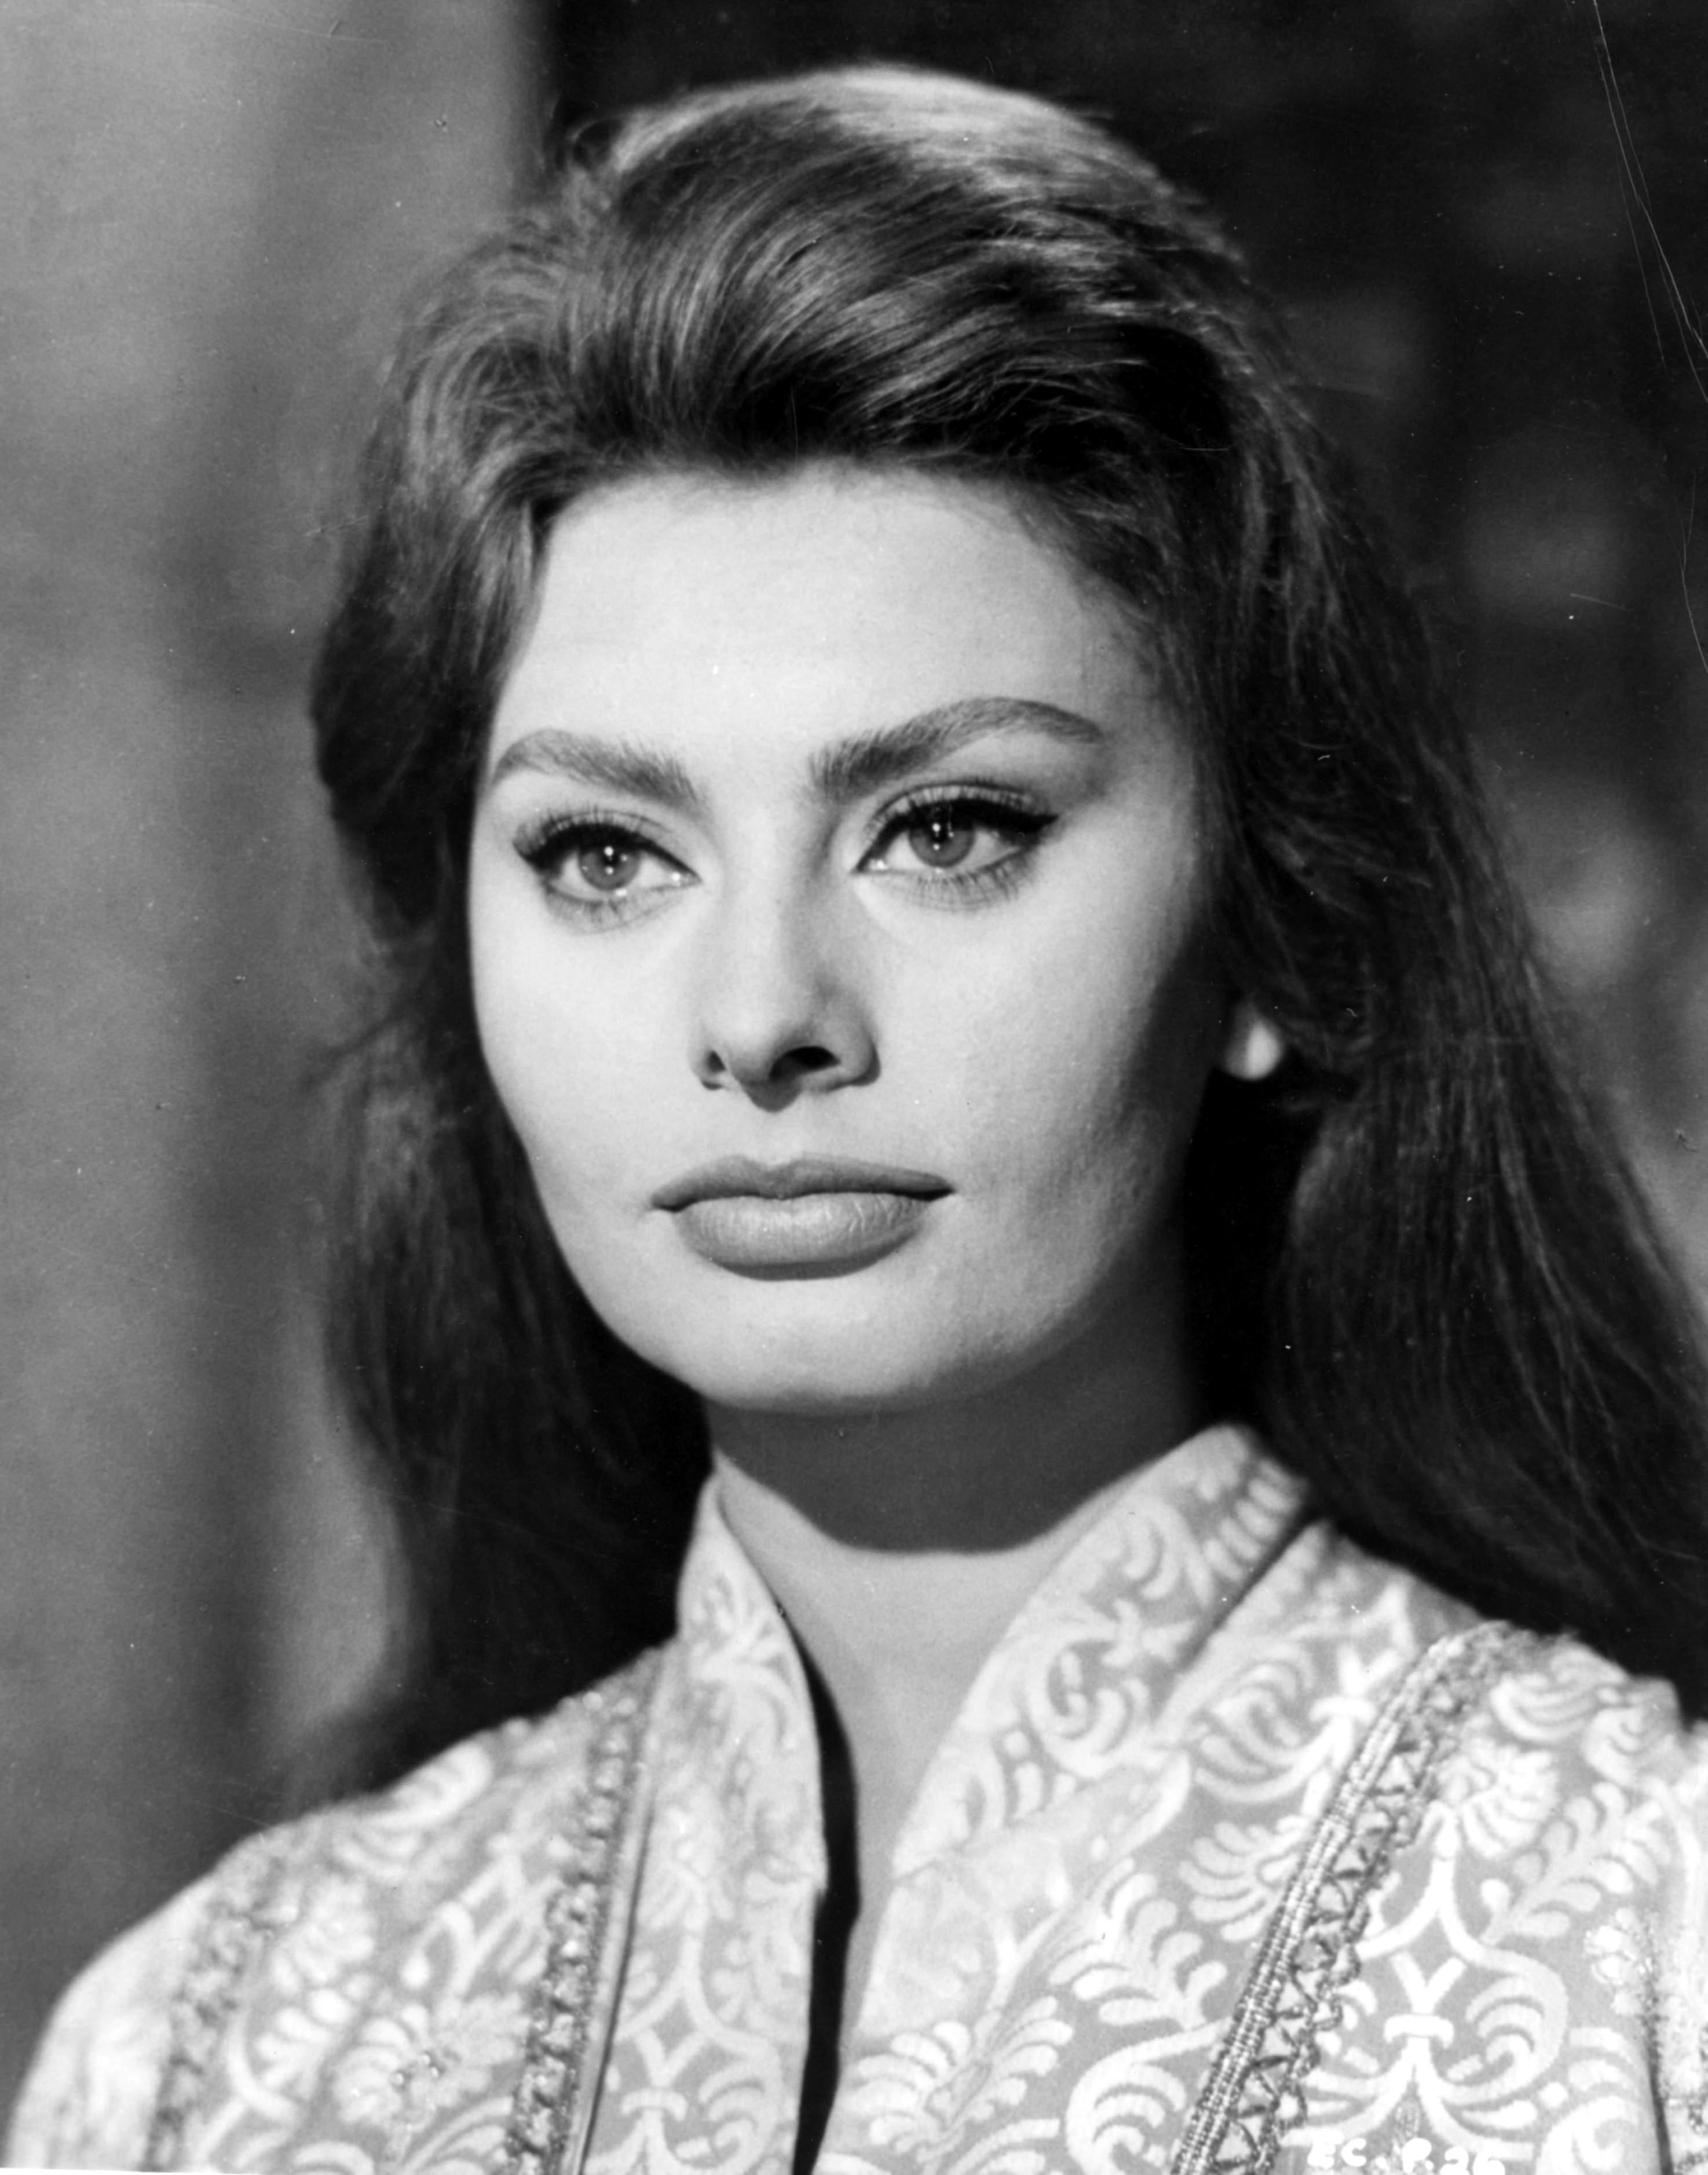 Sophia Loren Sophia Loren Kosty 555 Info 292 Sophia